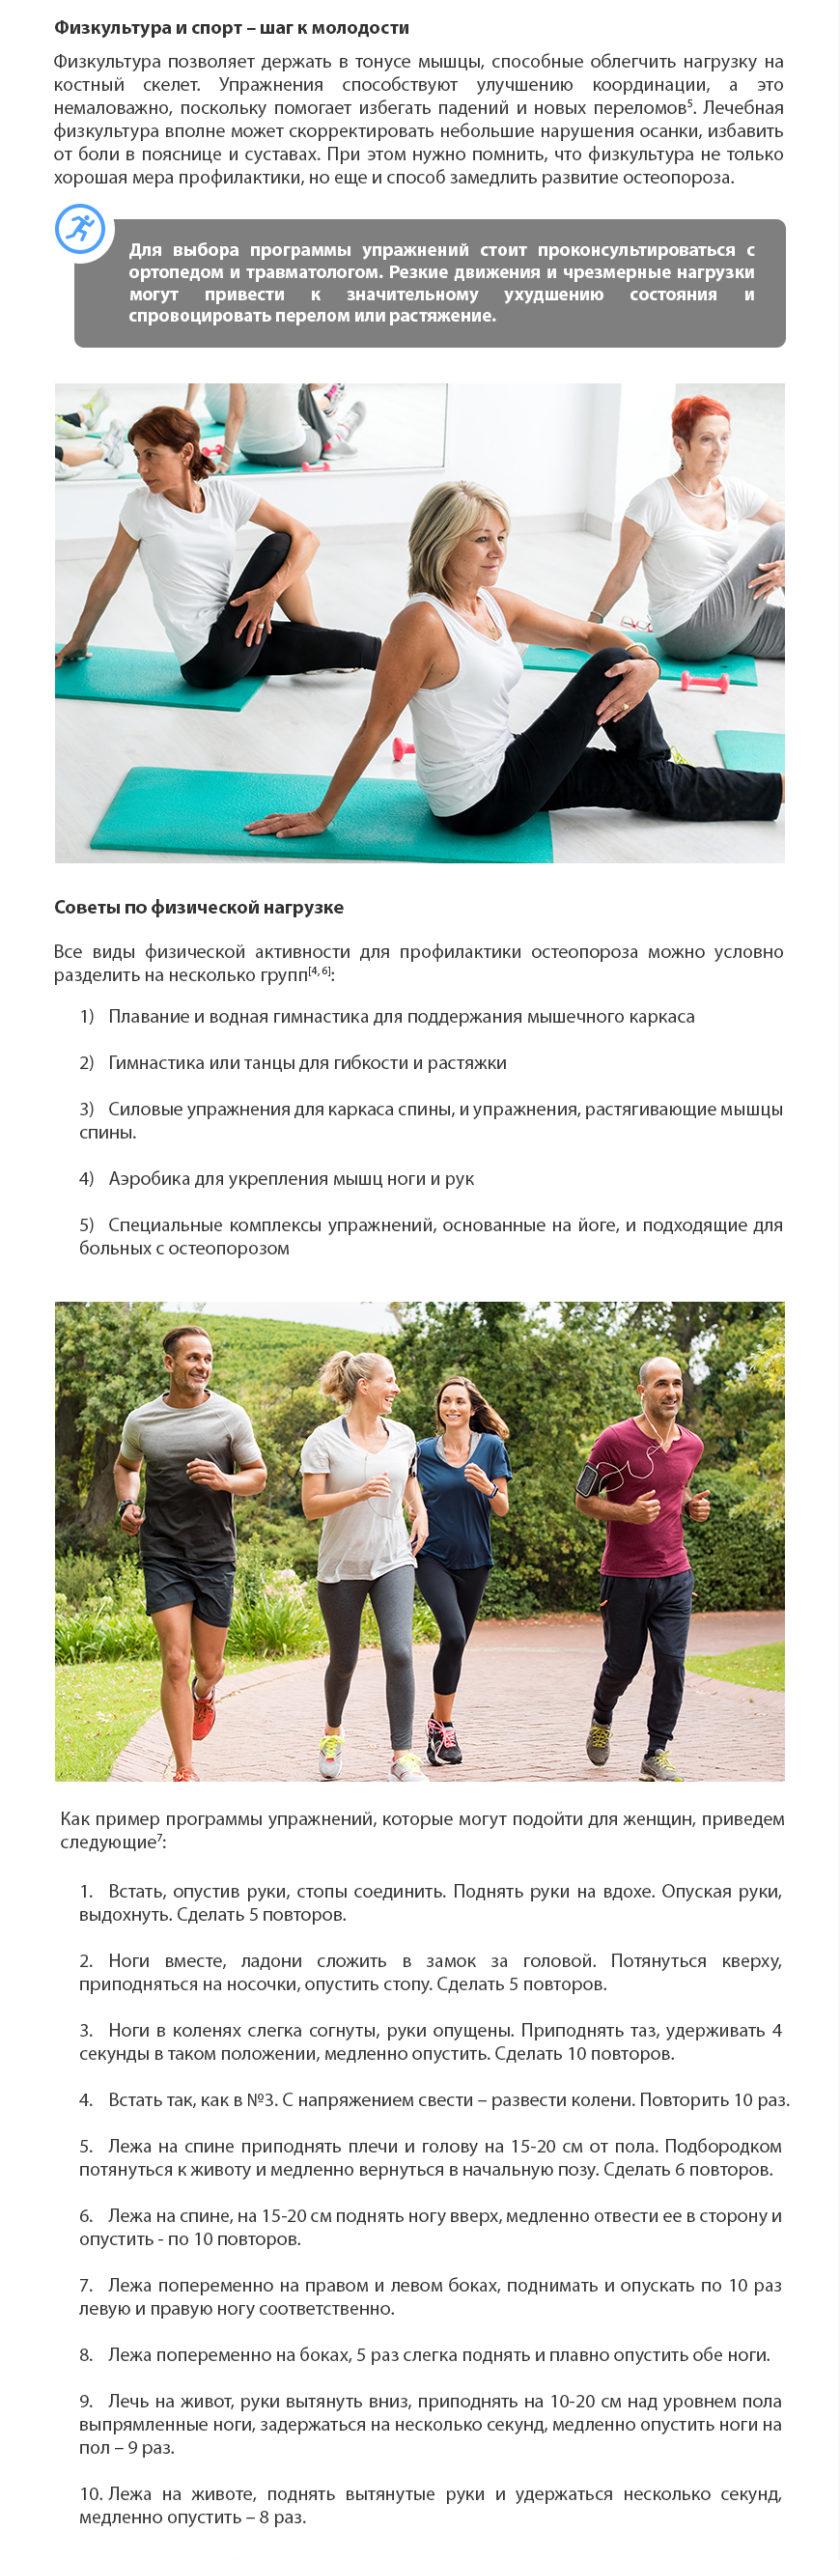 01 ТЕВА Бегом от остеопороза 17 01 2018